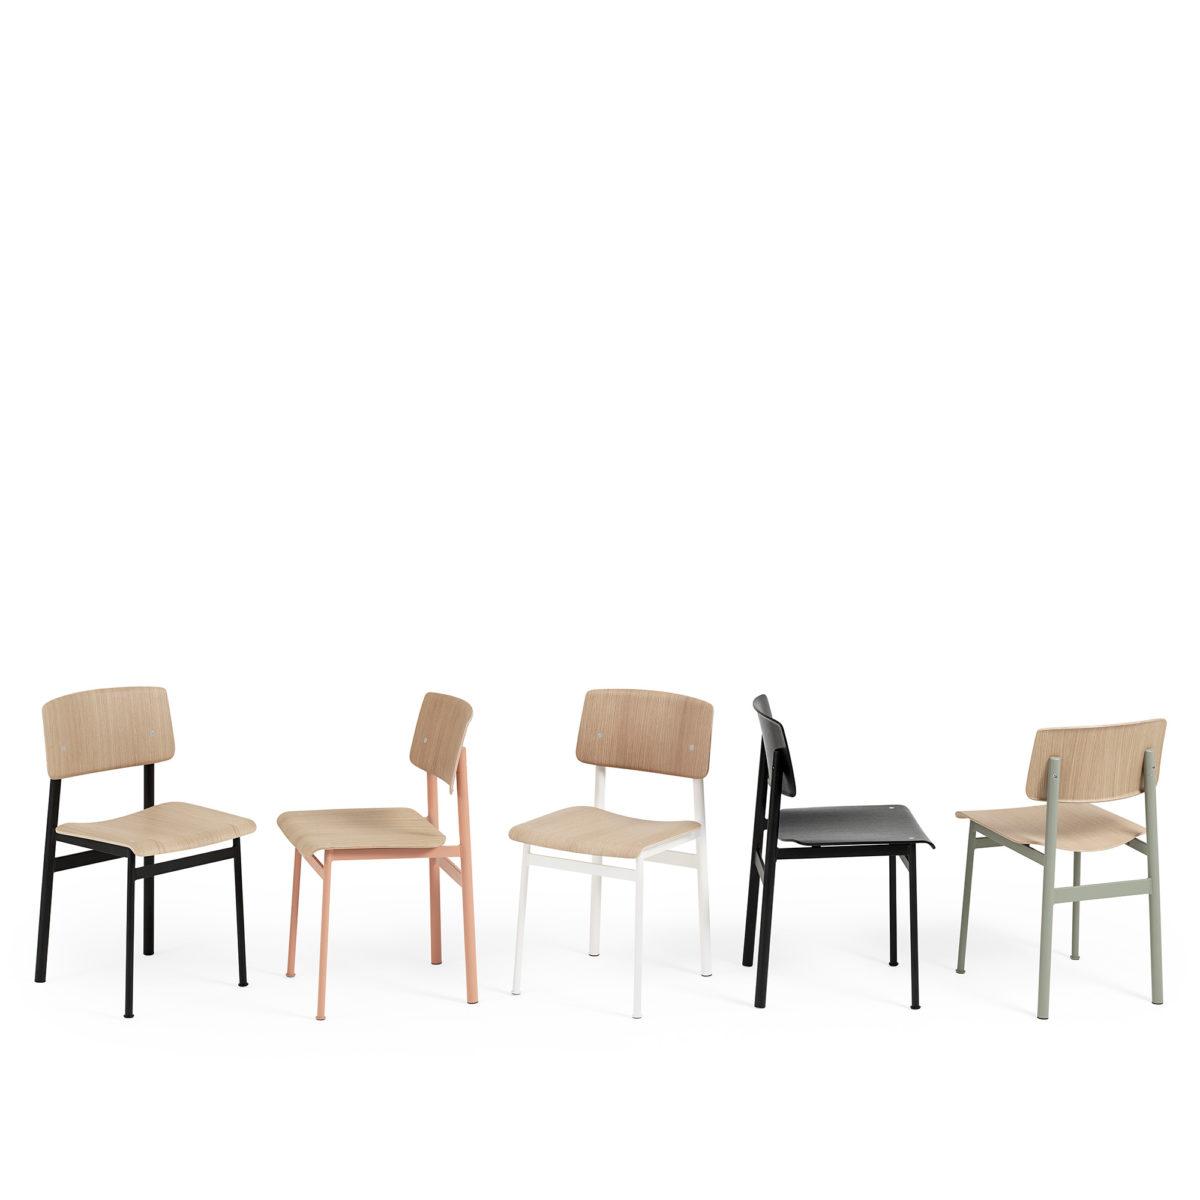 Loft Chair Thomas Bentzen Industrial Design